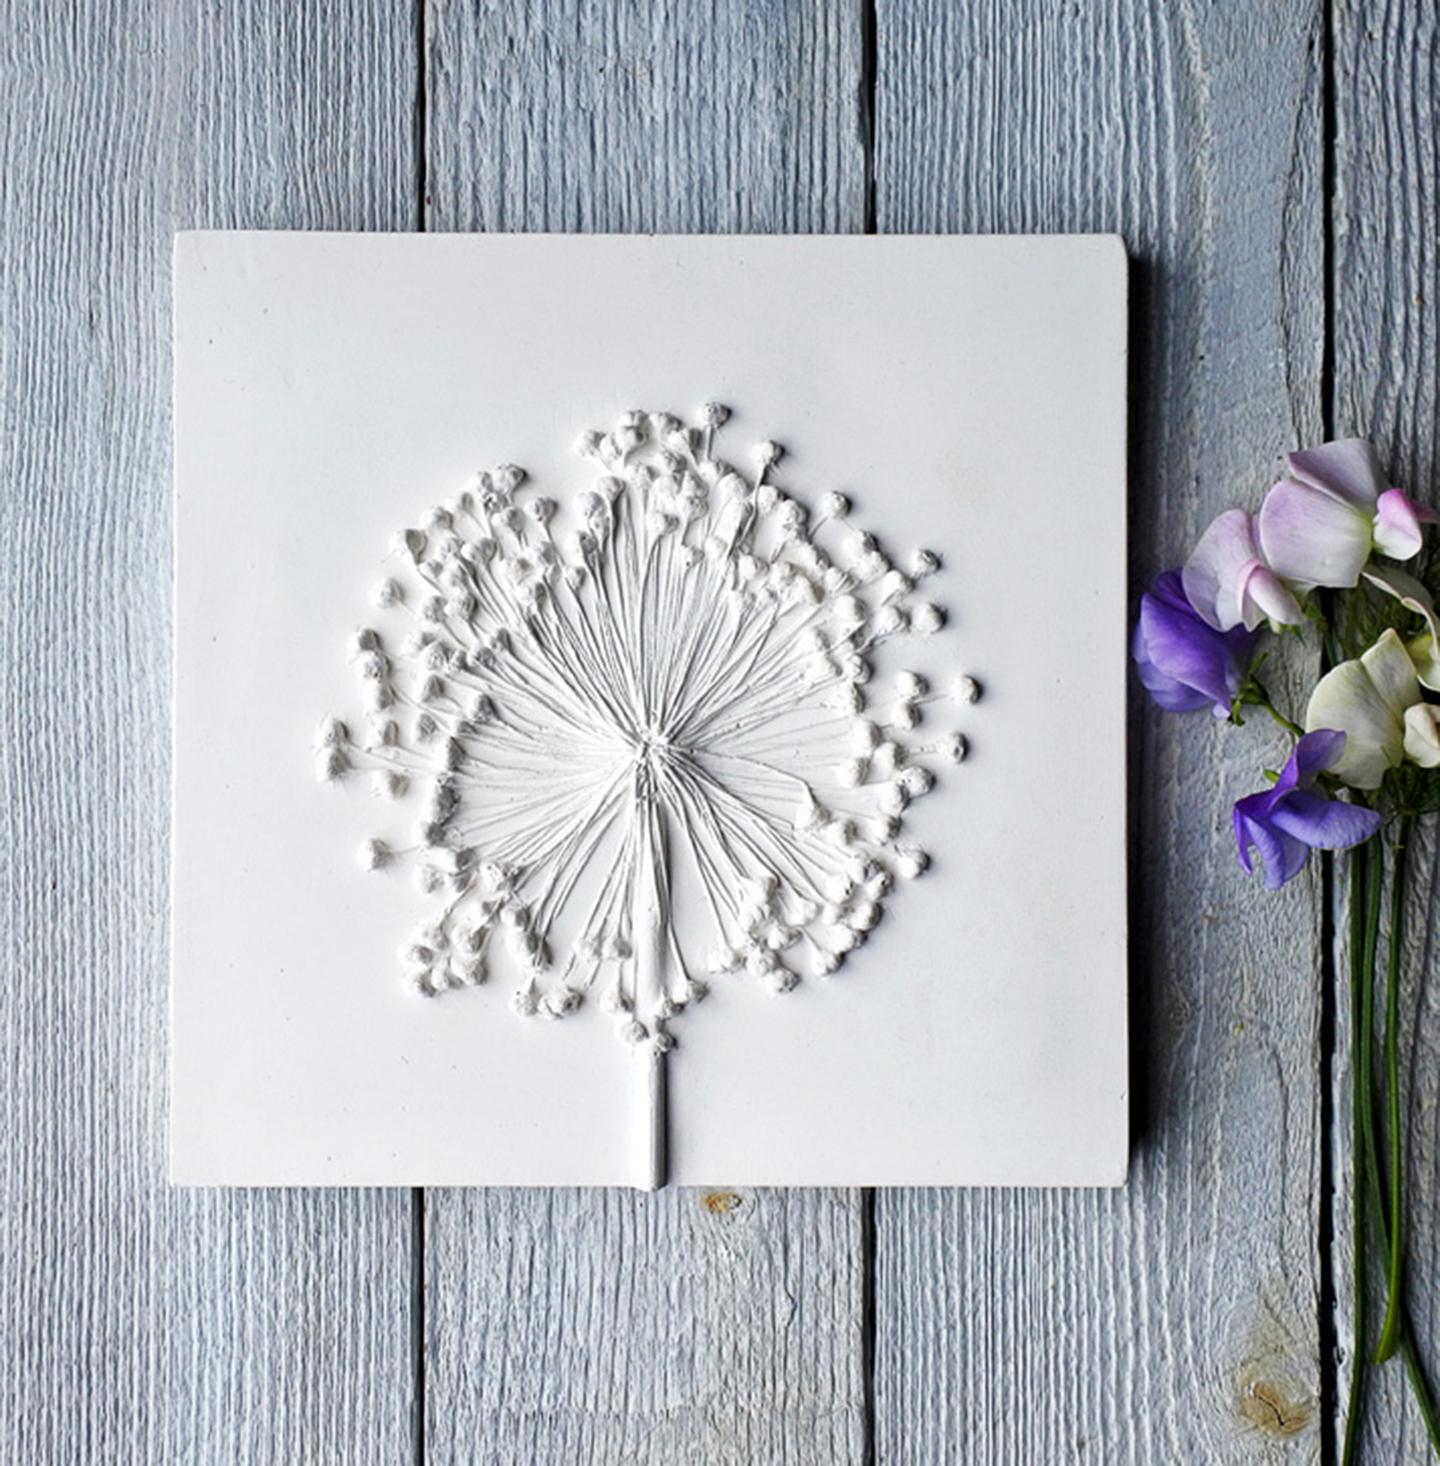 Gray-Allium-4-1440px-wide-7